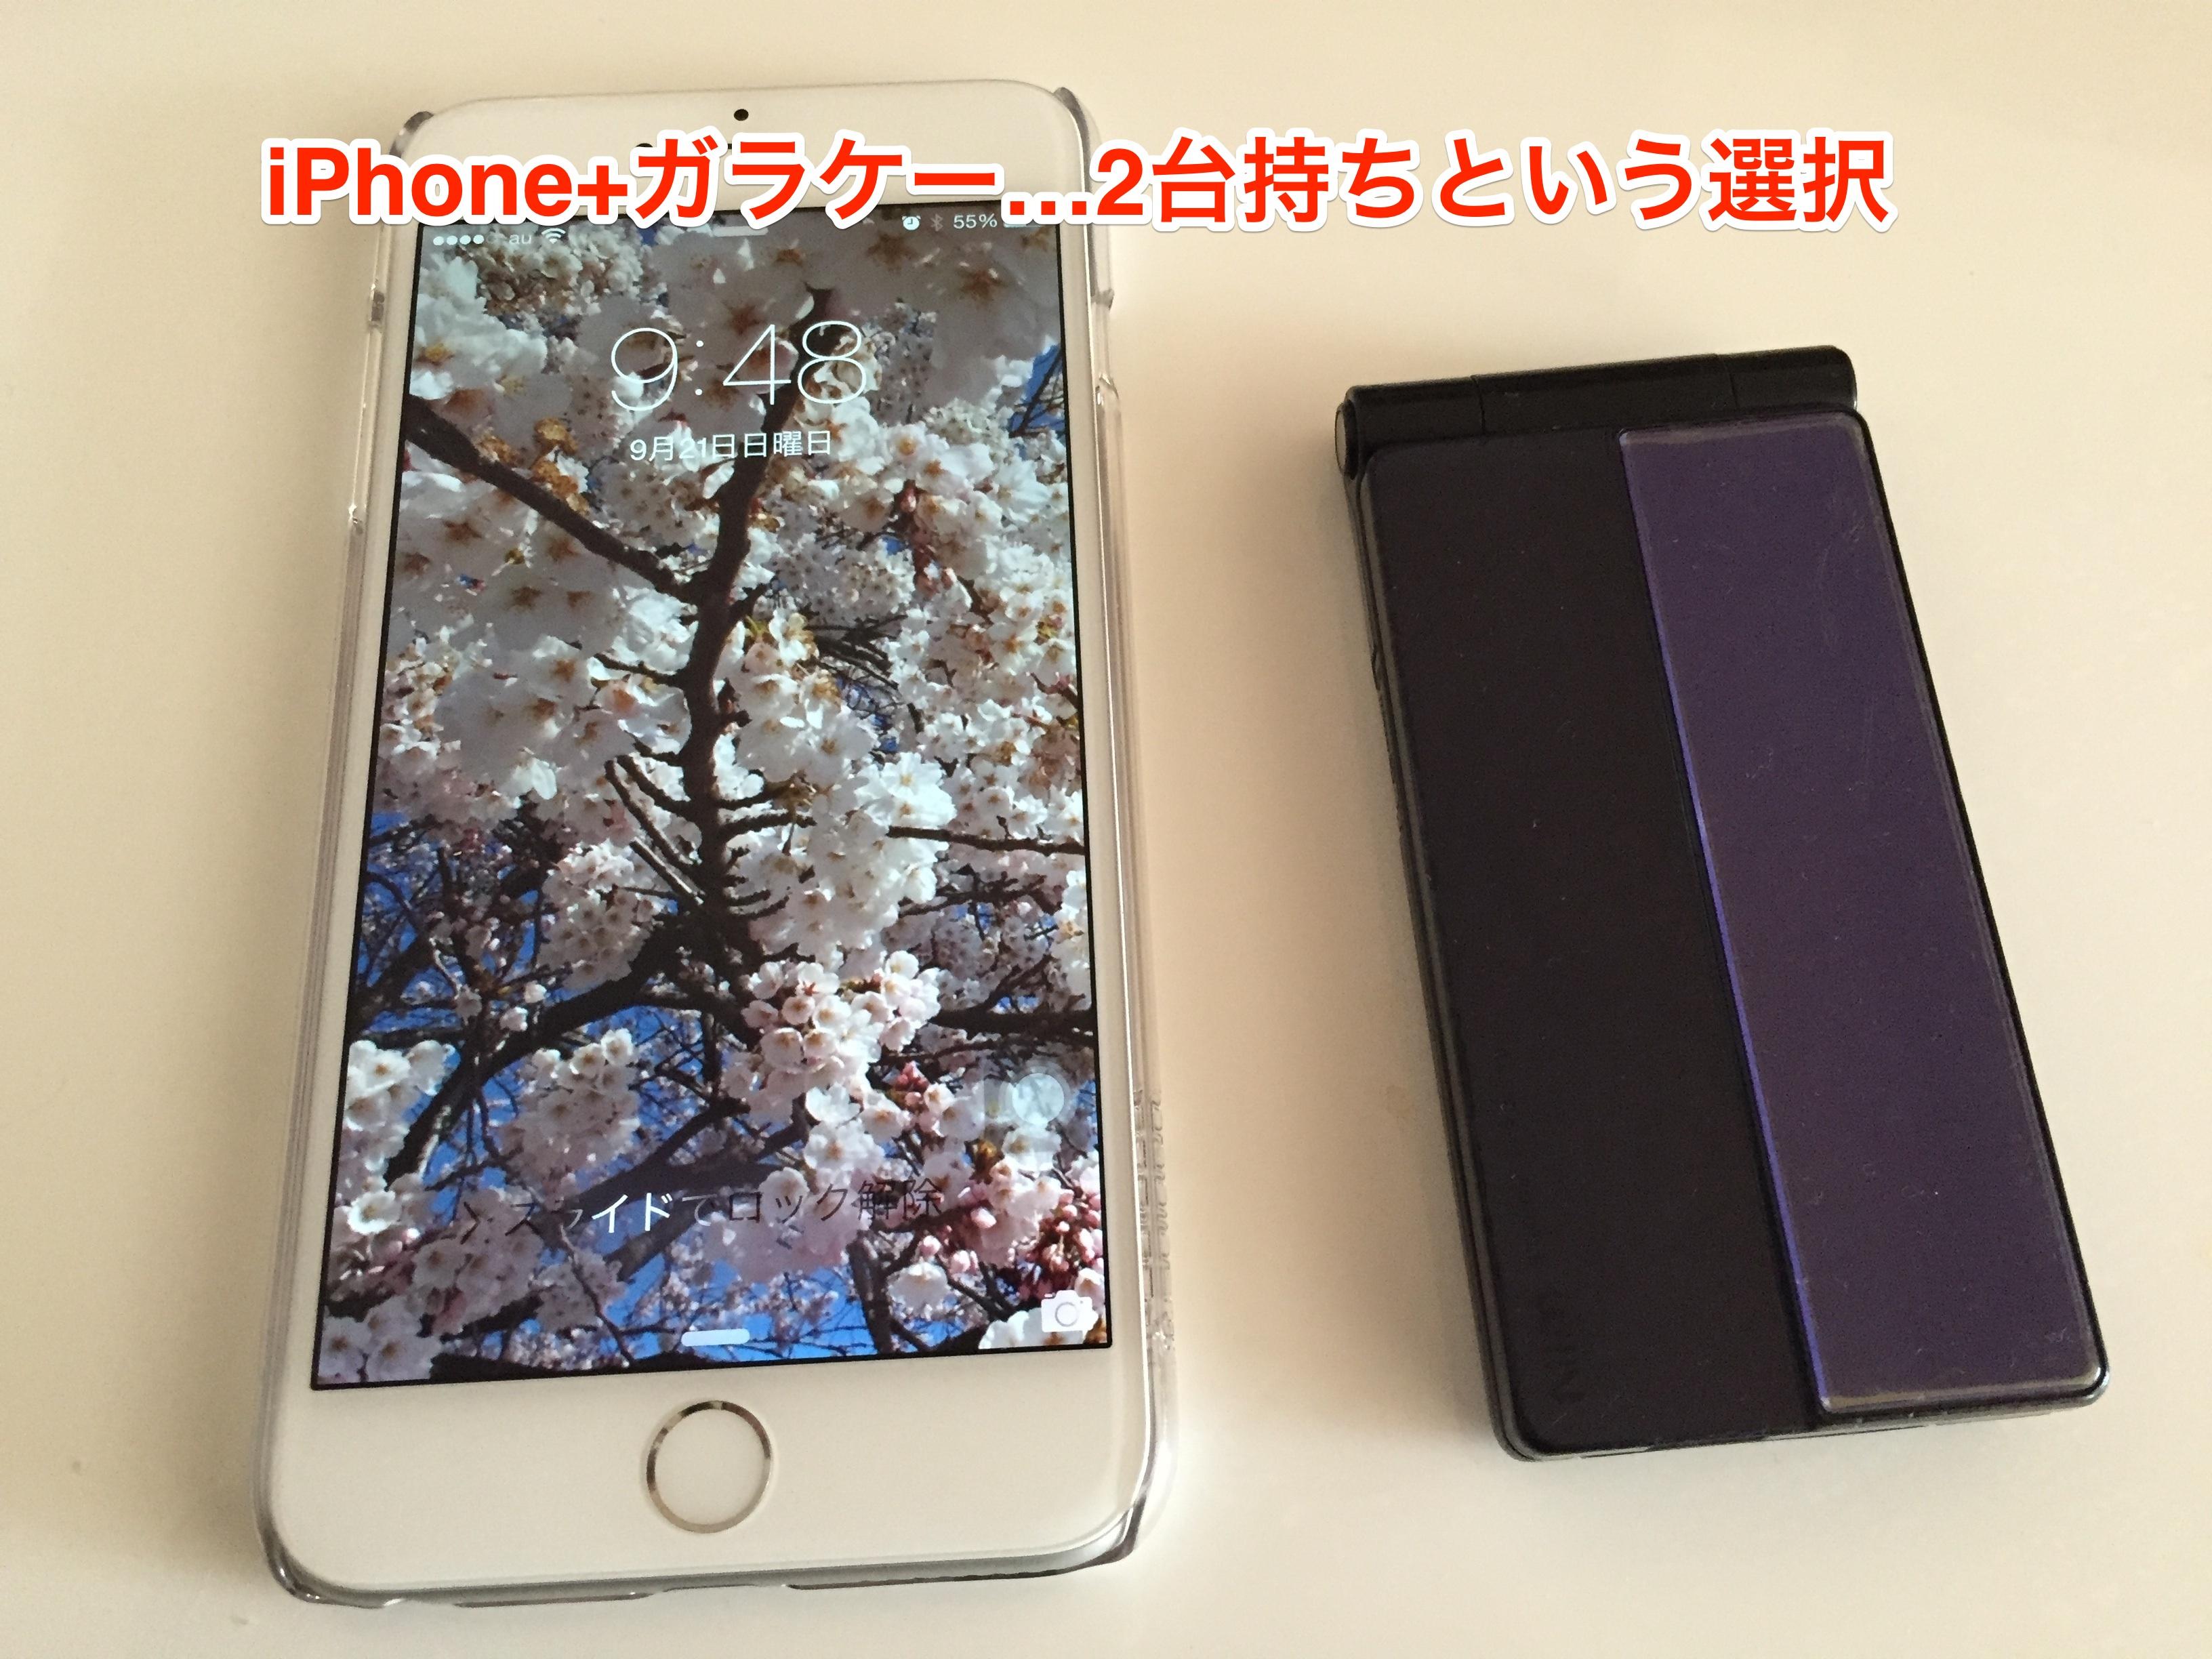 iPhone6SIMフリー+ガラケーの2台持ちは、はたしてお得なのか?